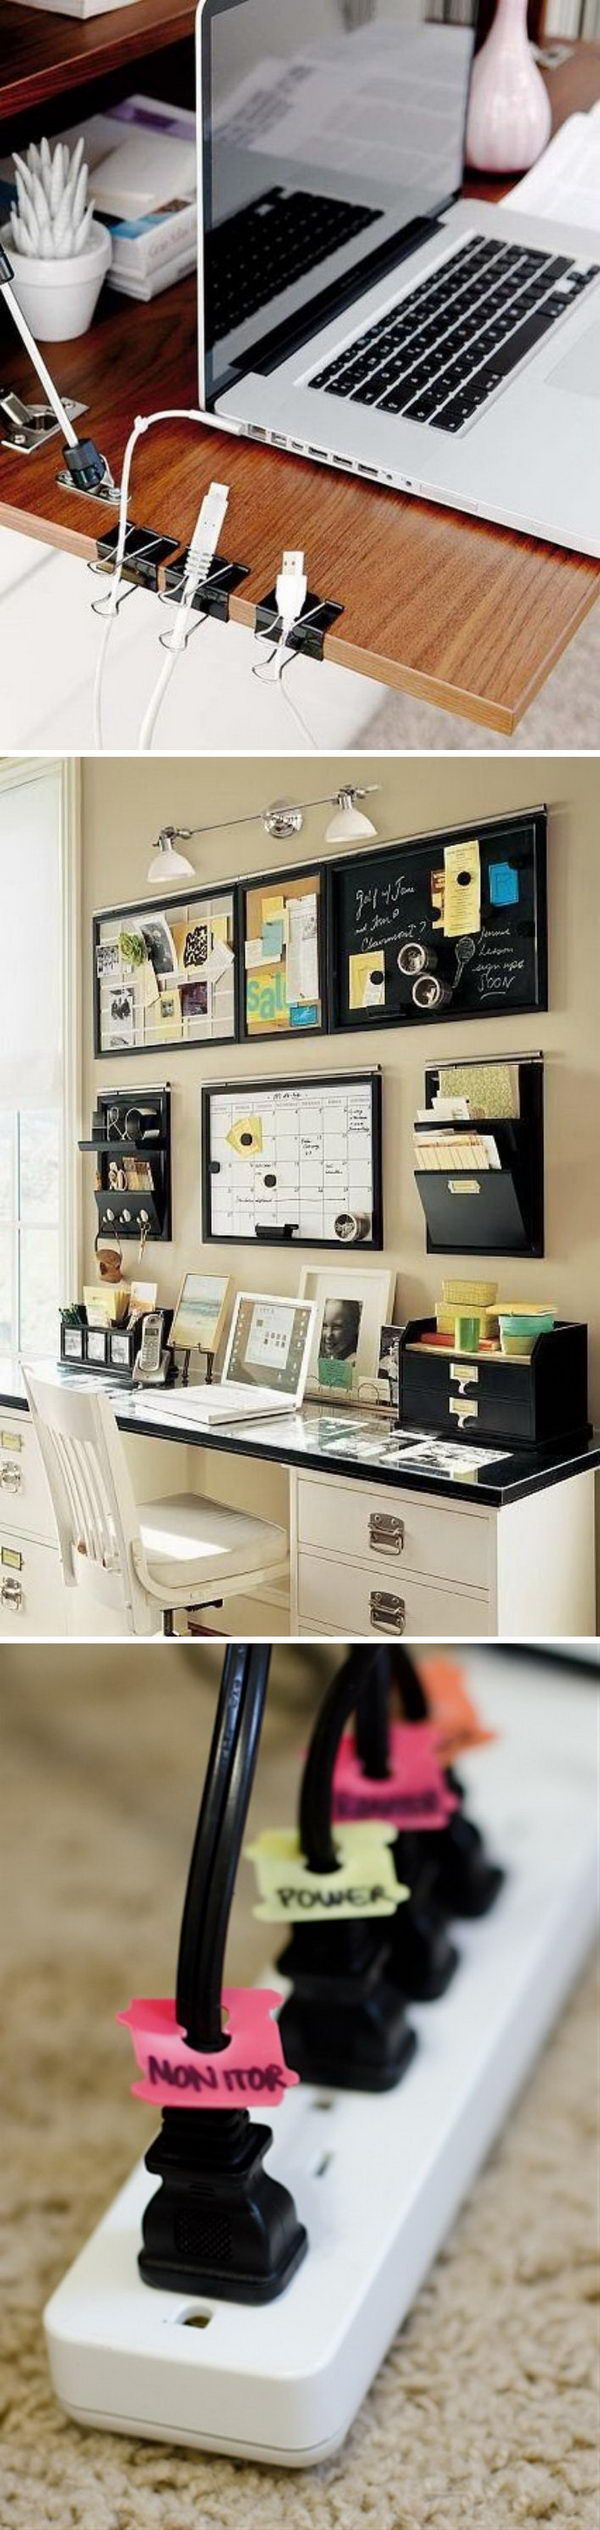 best 25 work office decorations ideas on pinterest decorating work cubicle work desk decor. Black Bedroom Furniture Sets. Home Design Ideas